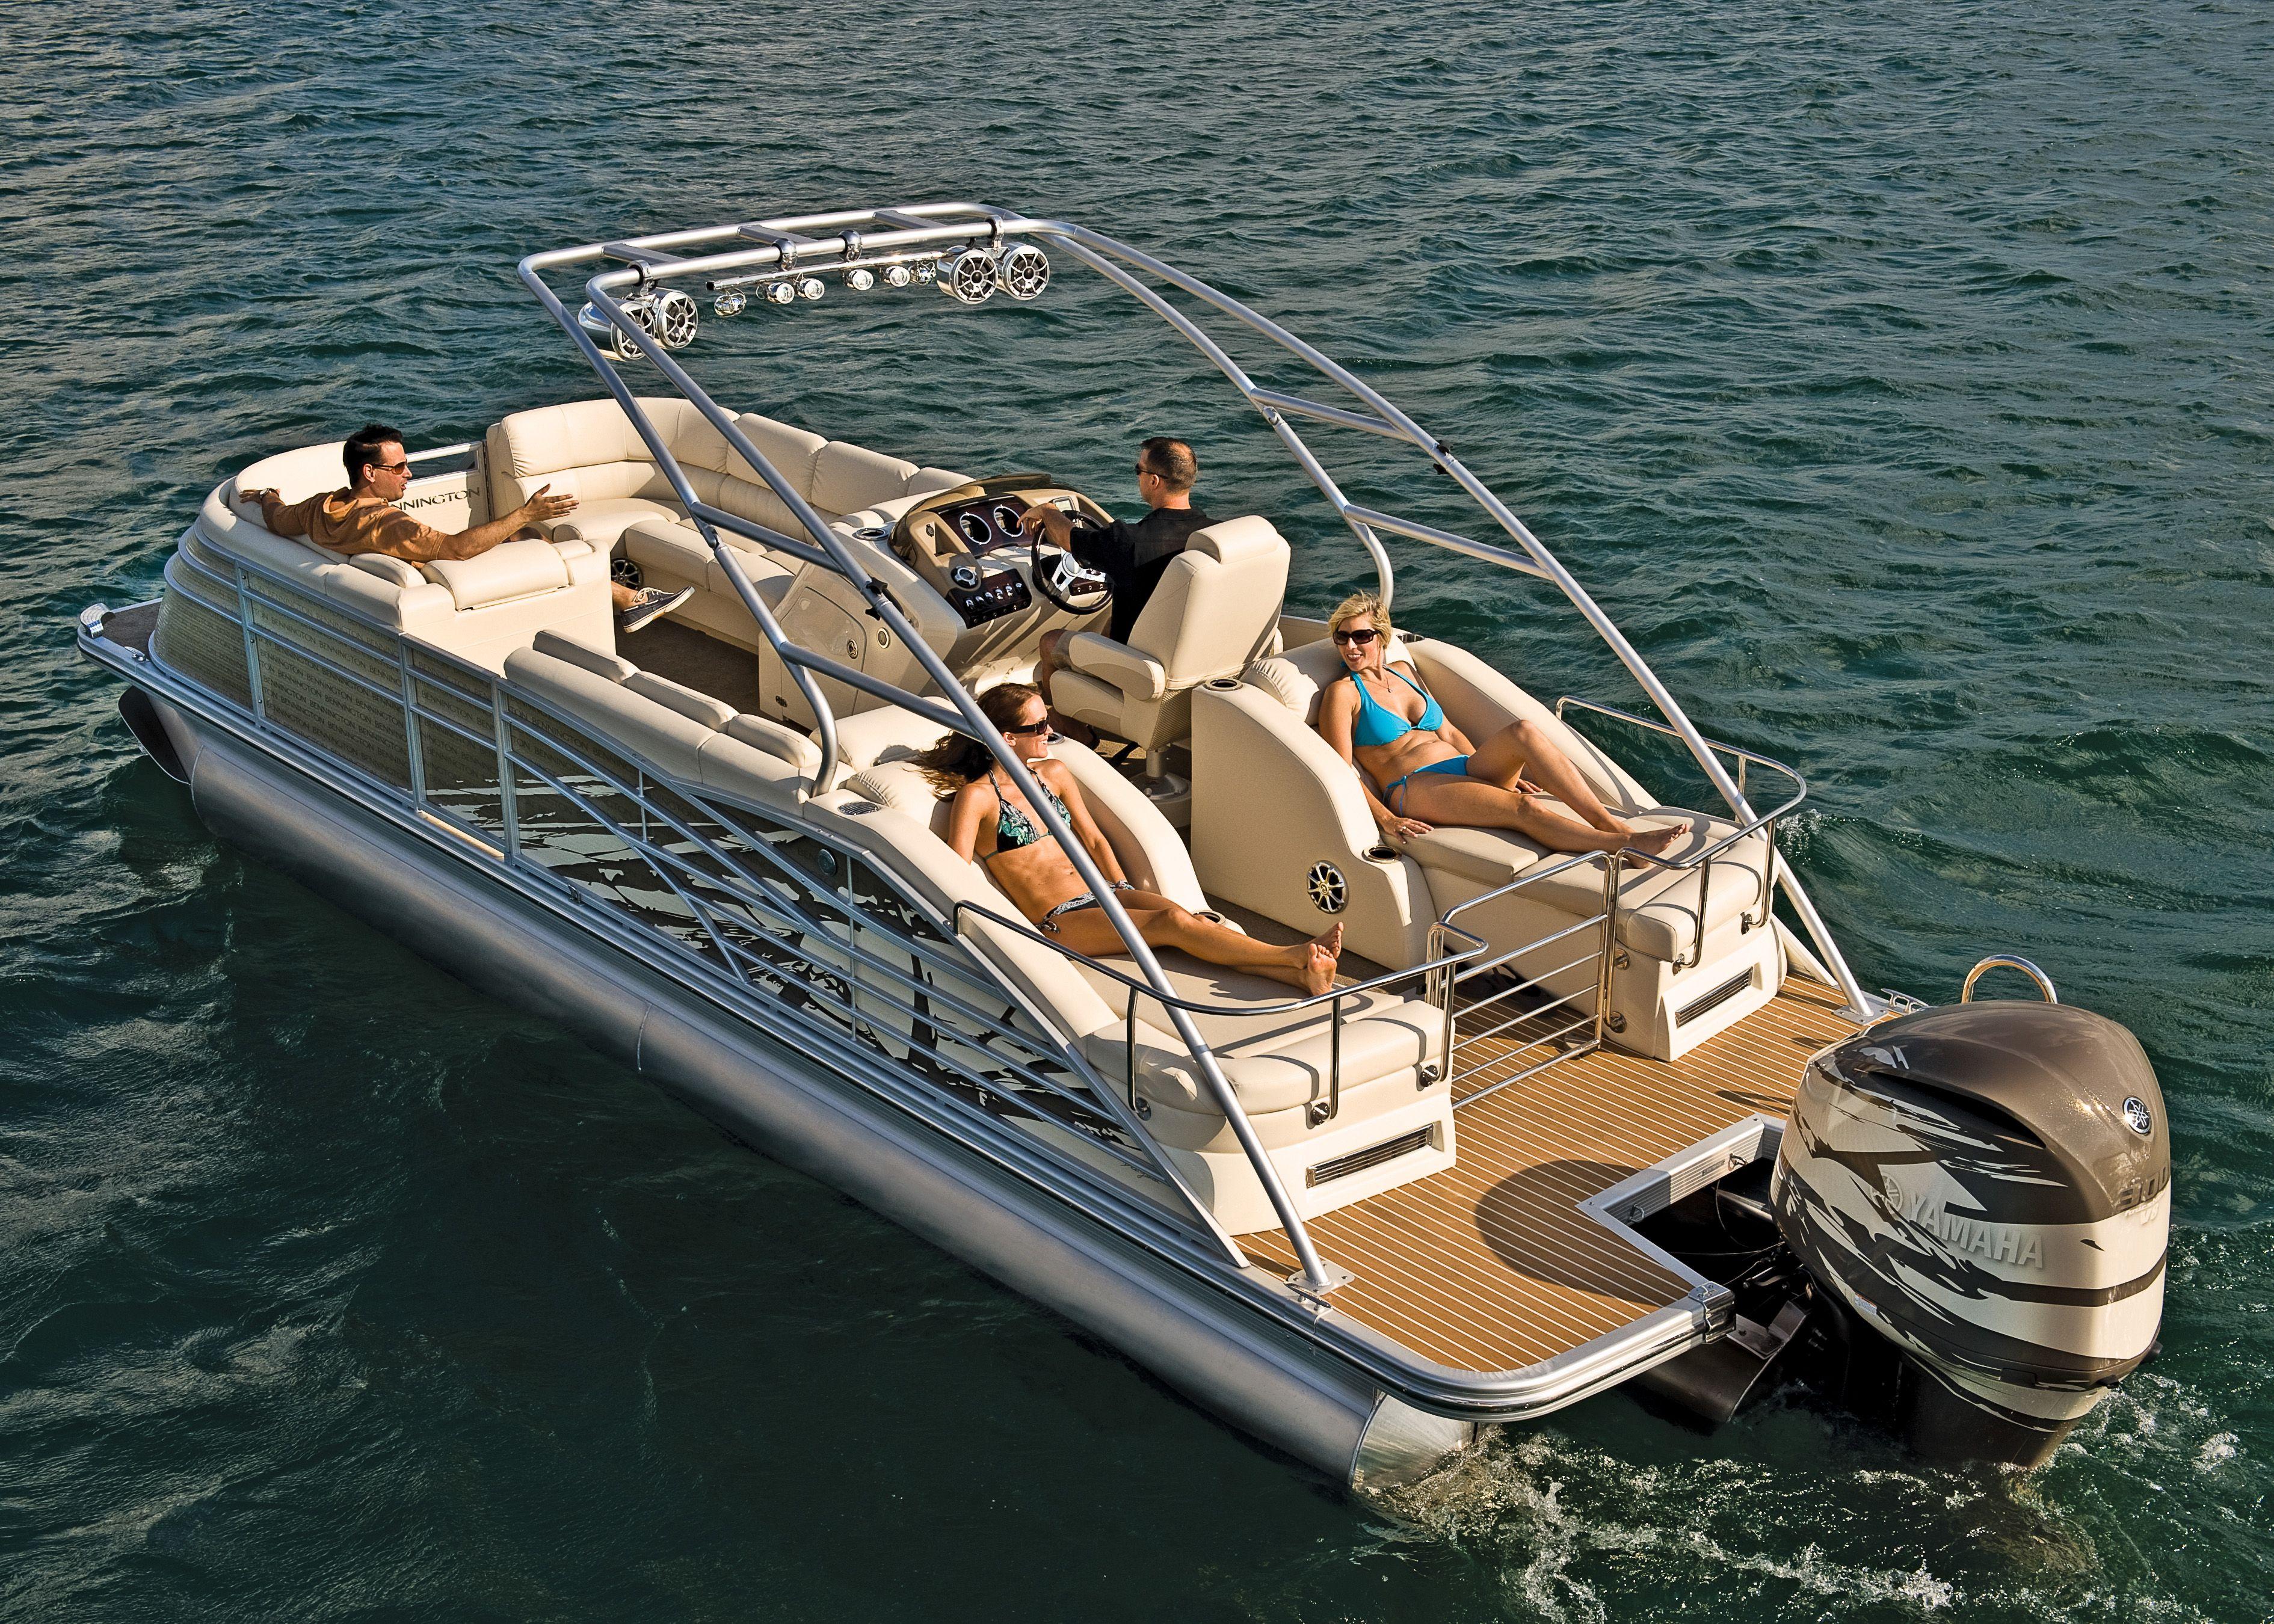 medium resolution of 2012 bennington q25 pontoon boat from bennington pontoon great for sunnyday boating